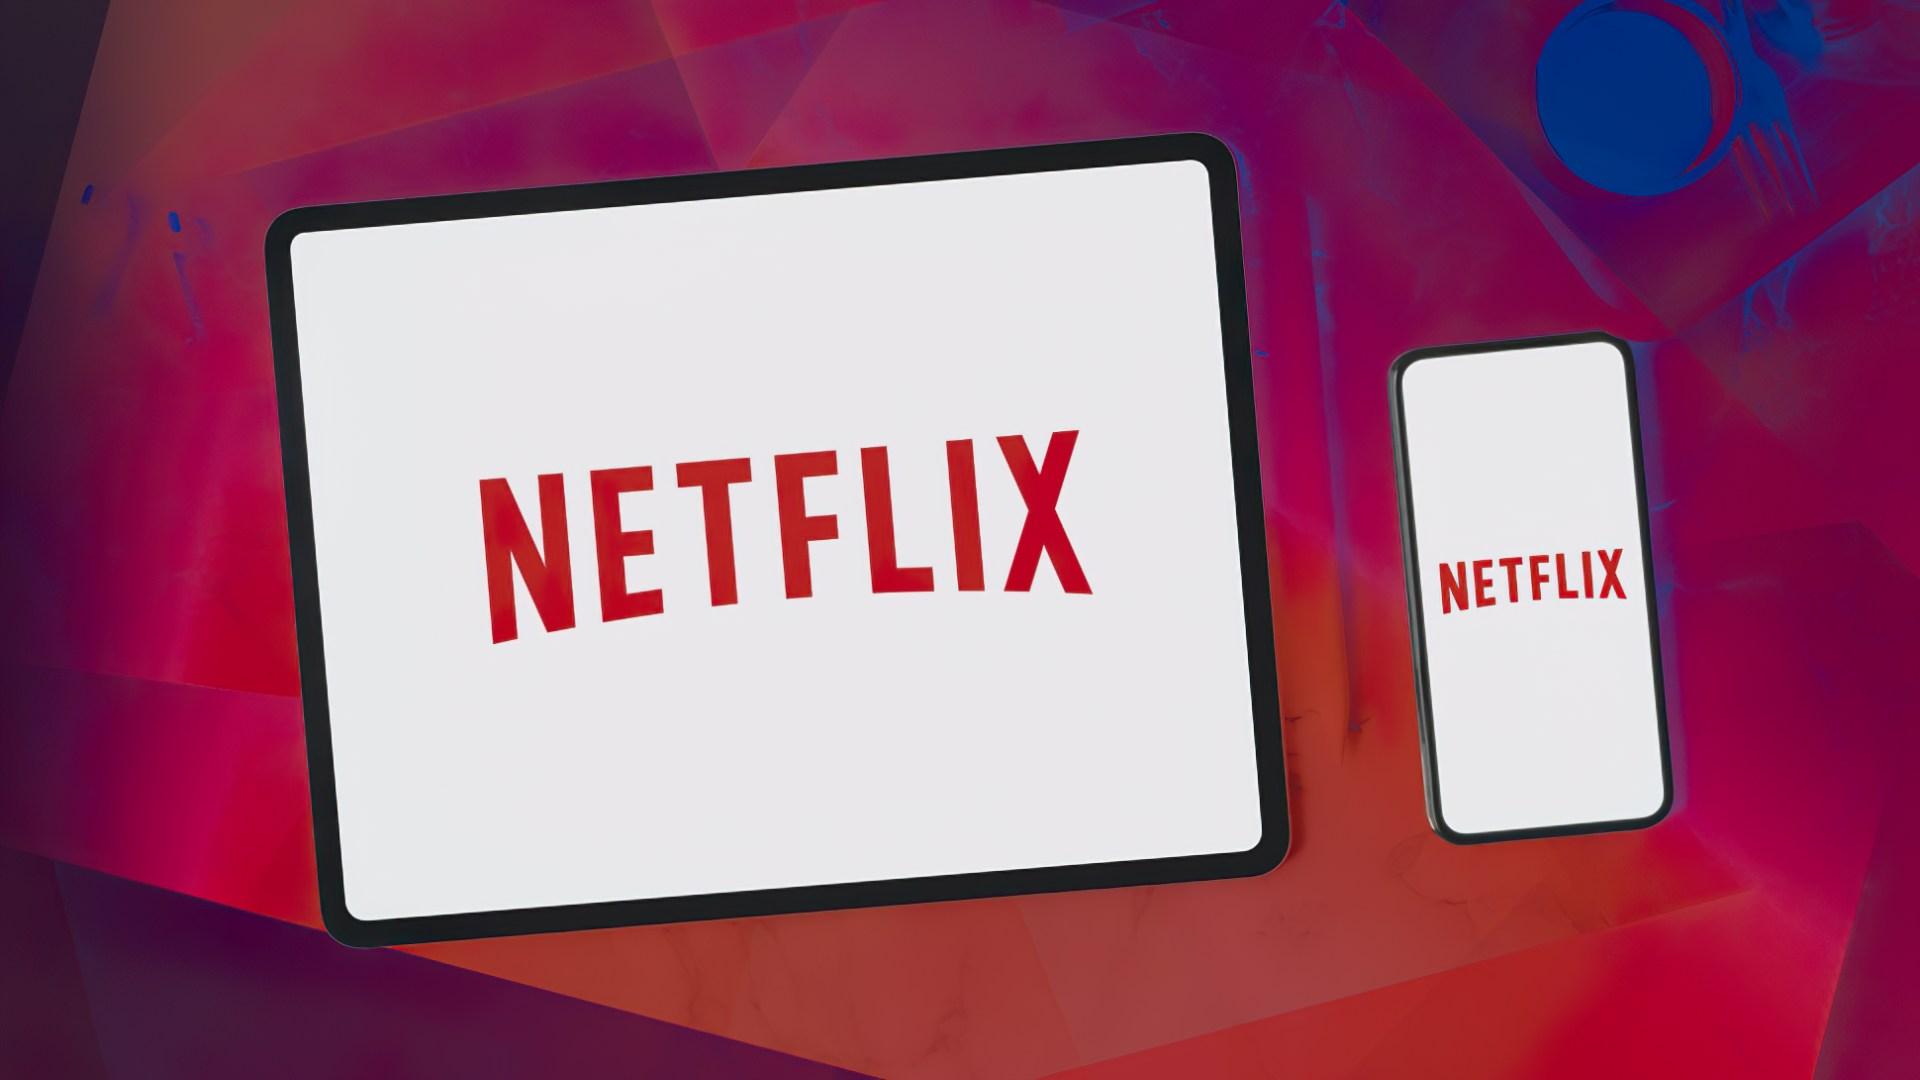 Smartphone, Tablet, Streaming, Logo, Netflix, Videoplattform, Streamingportal, Videostreaming, Netflix Logo, Netflix Originals